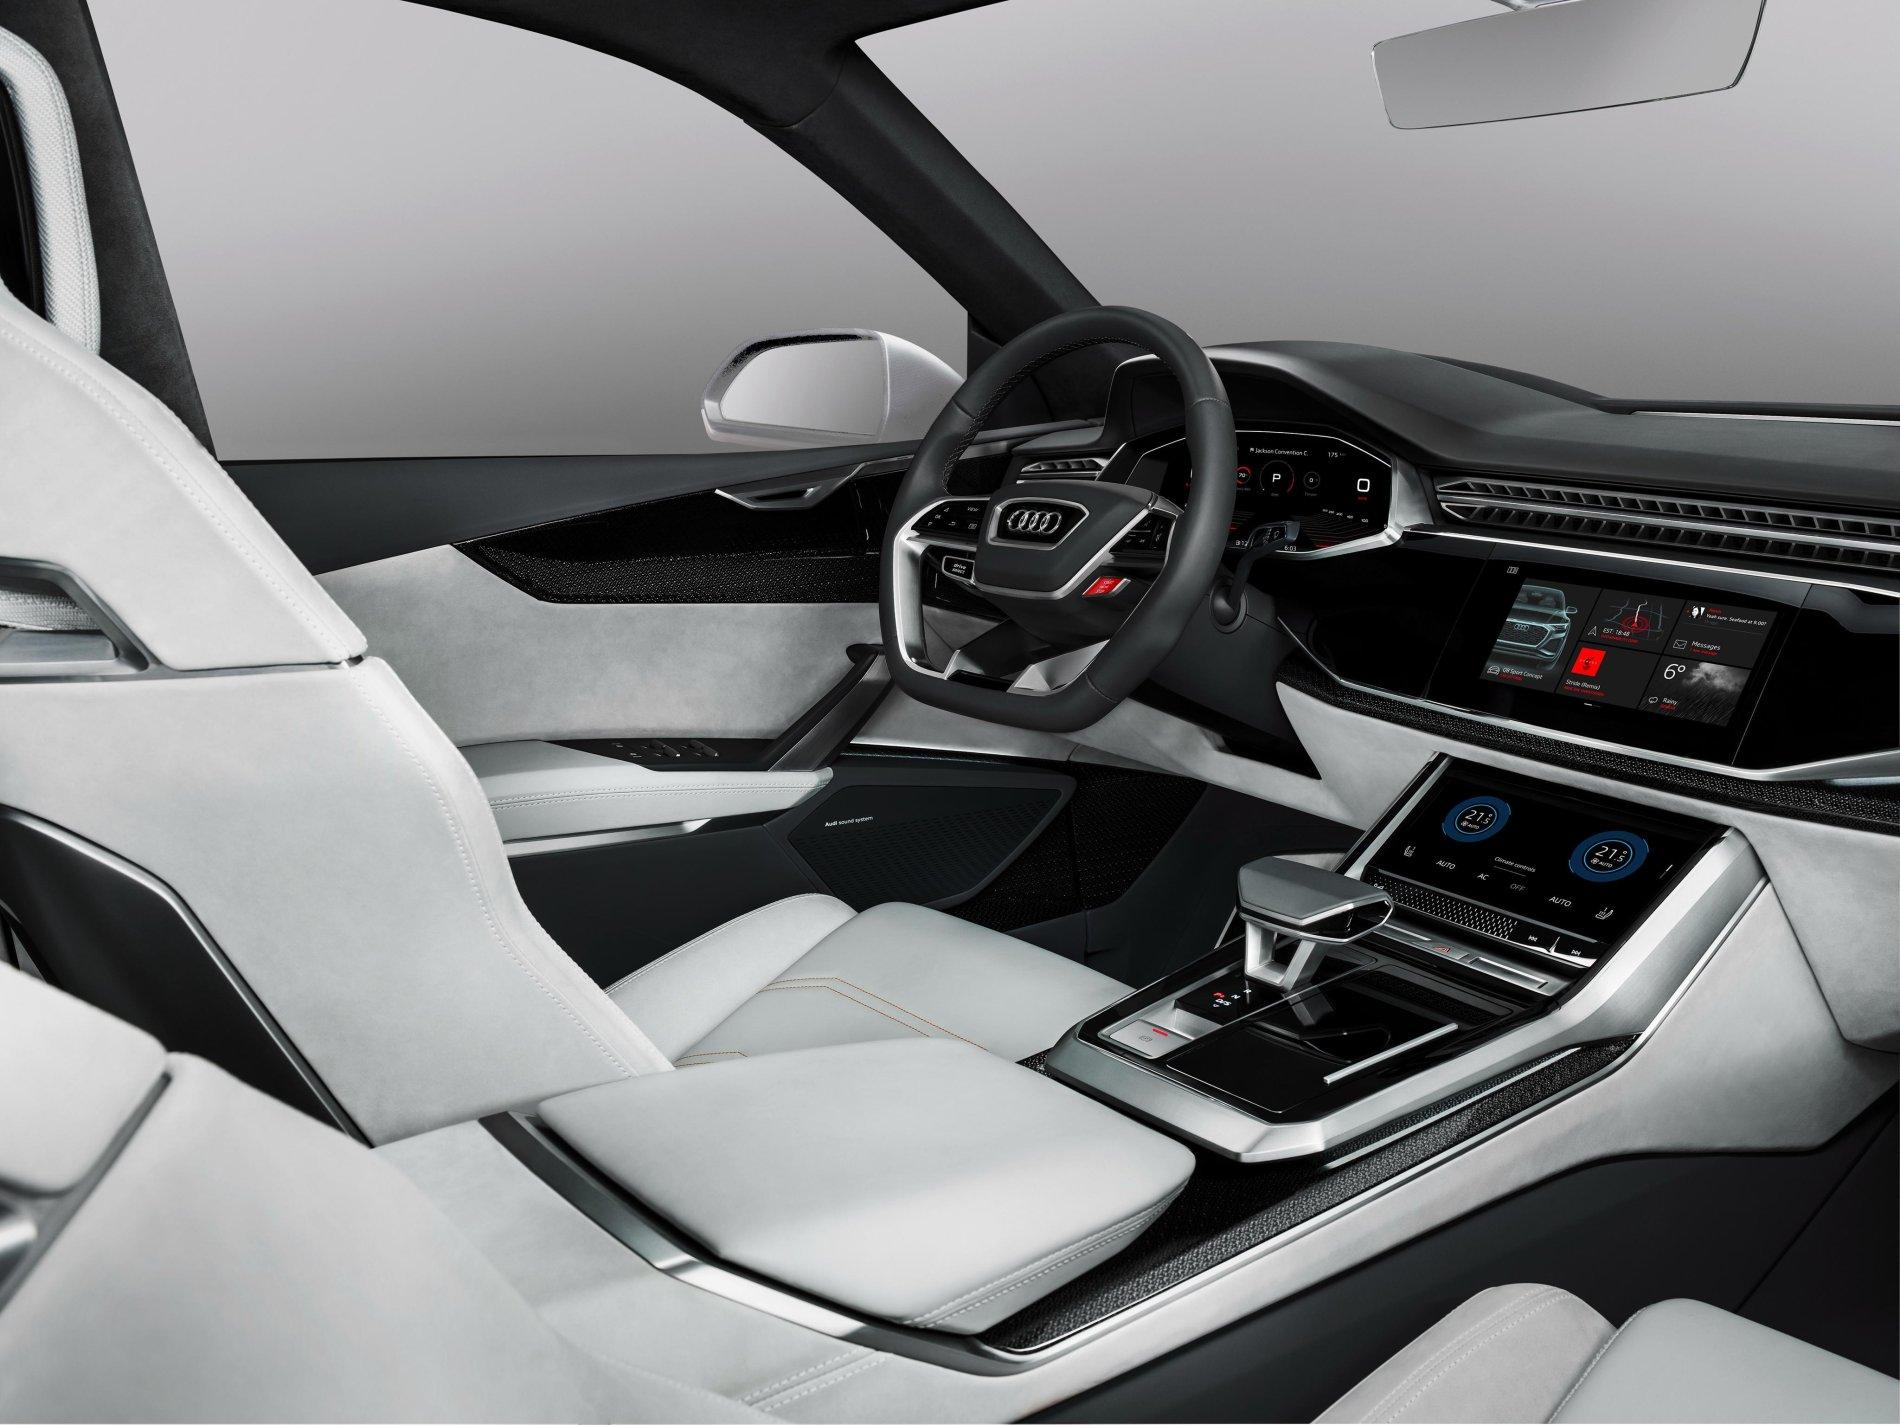 Audi Q8 Sport Concept - Audi Q8 Sport Concept